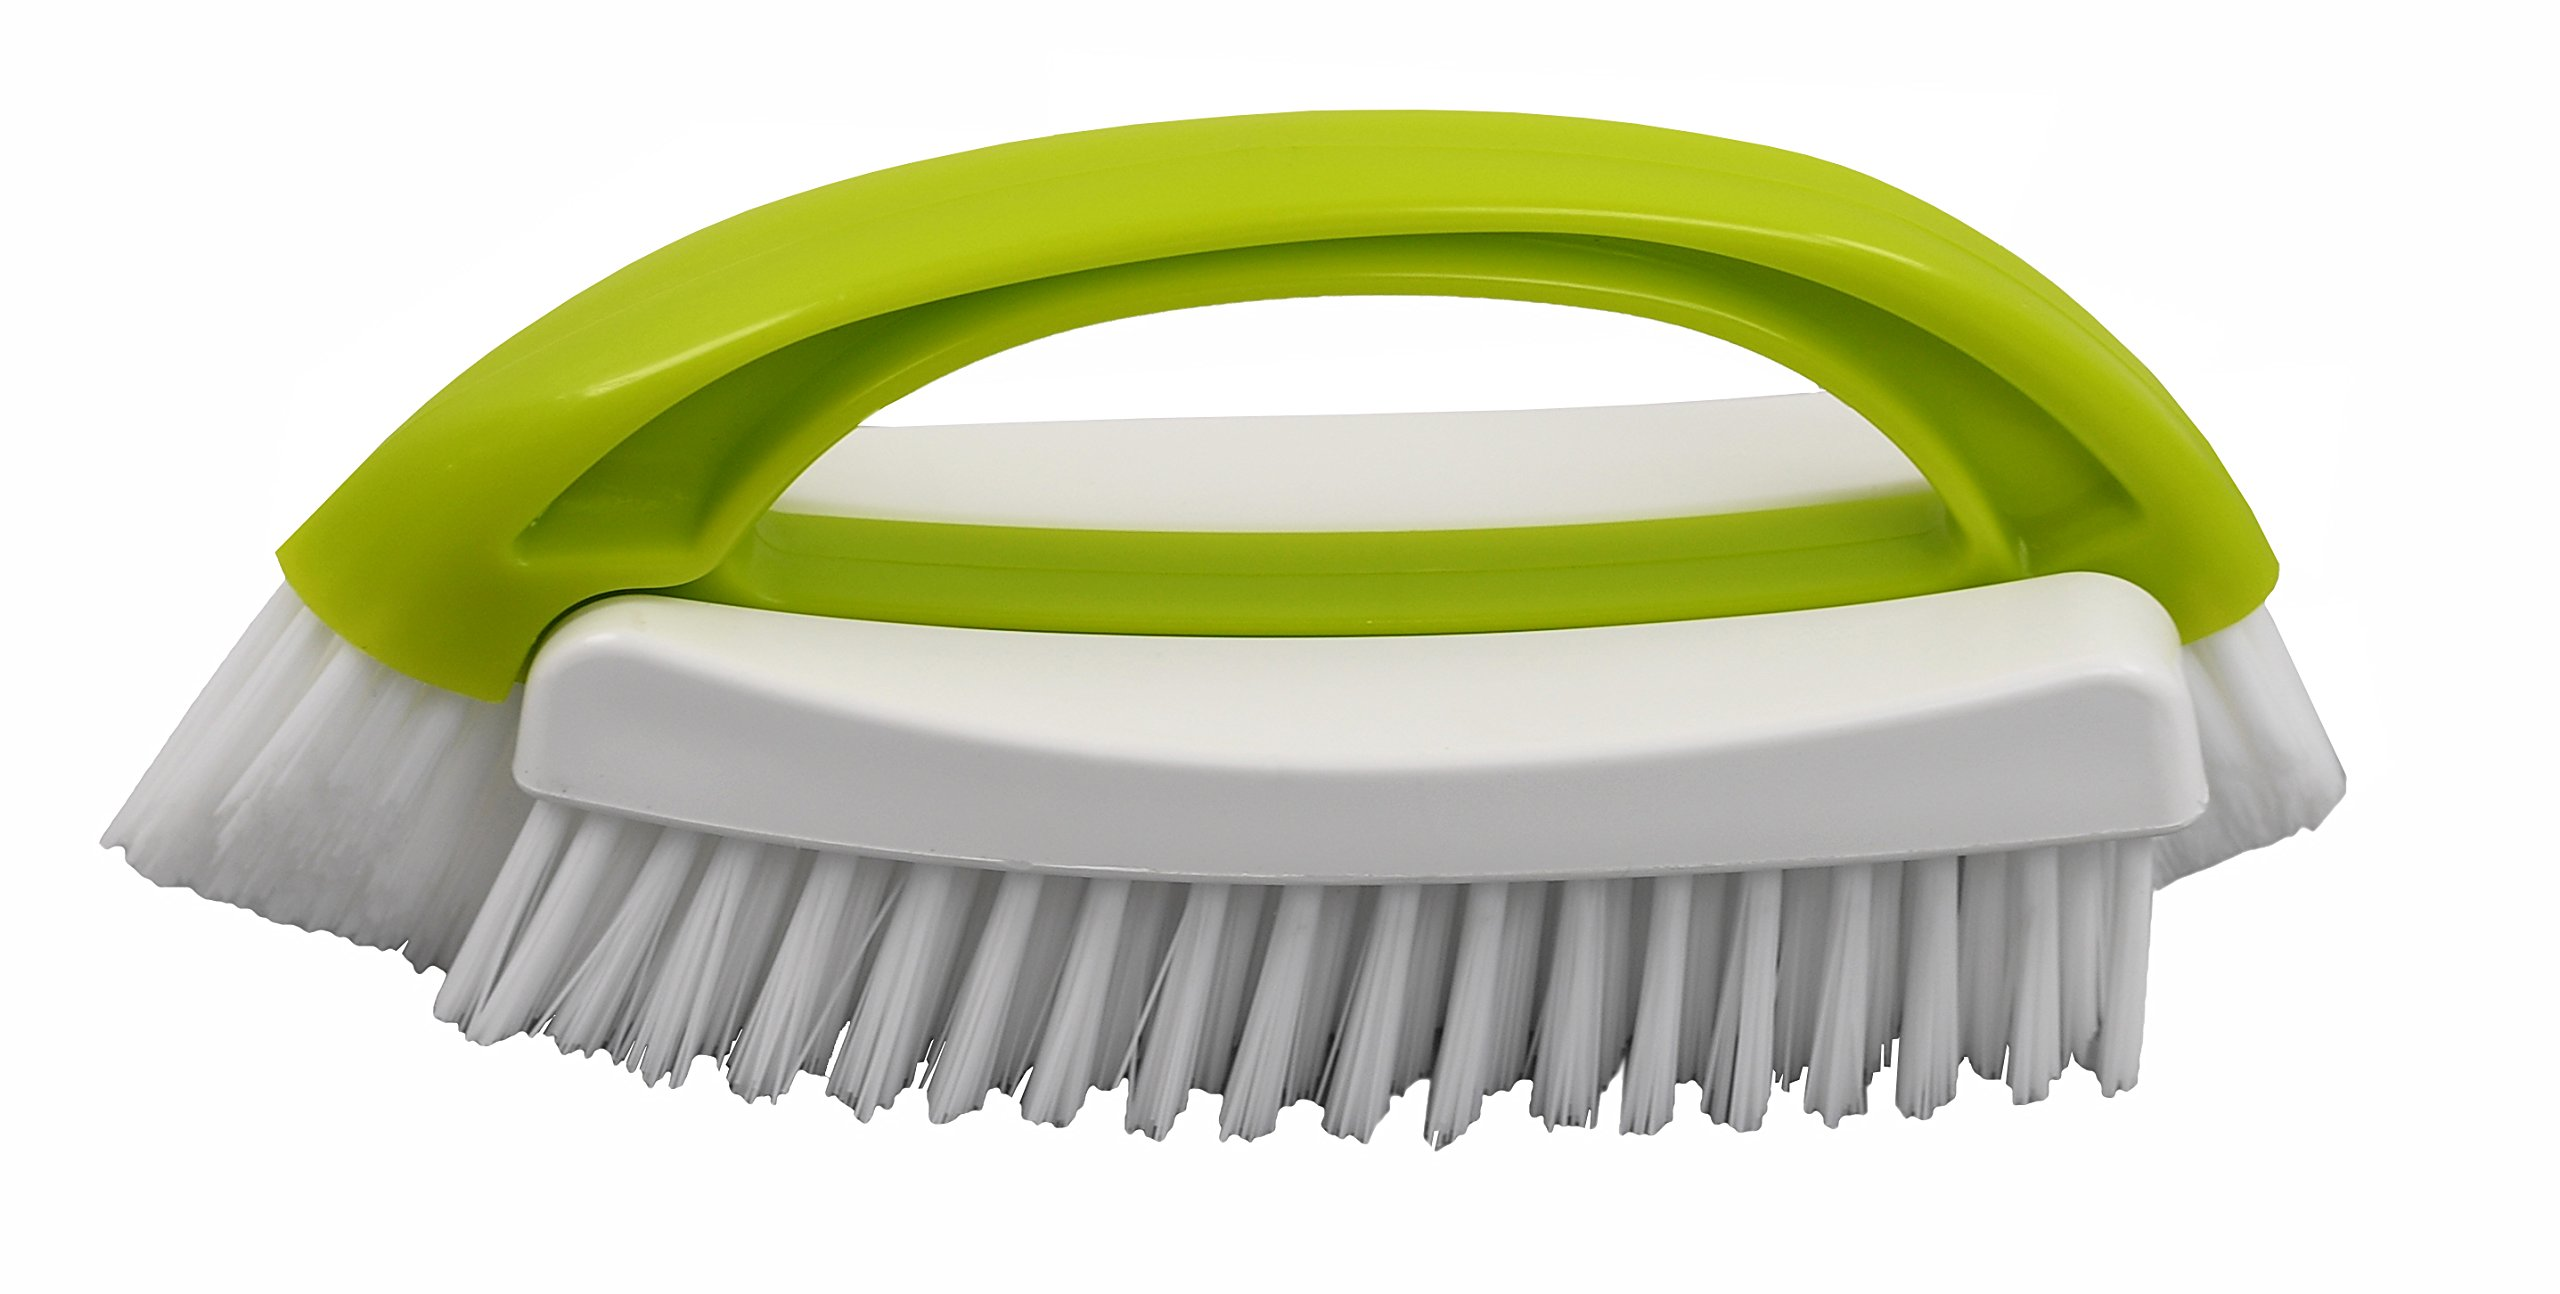 2 in 1 Multipurpose Detachable Scrub Brush - by Home-X